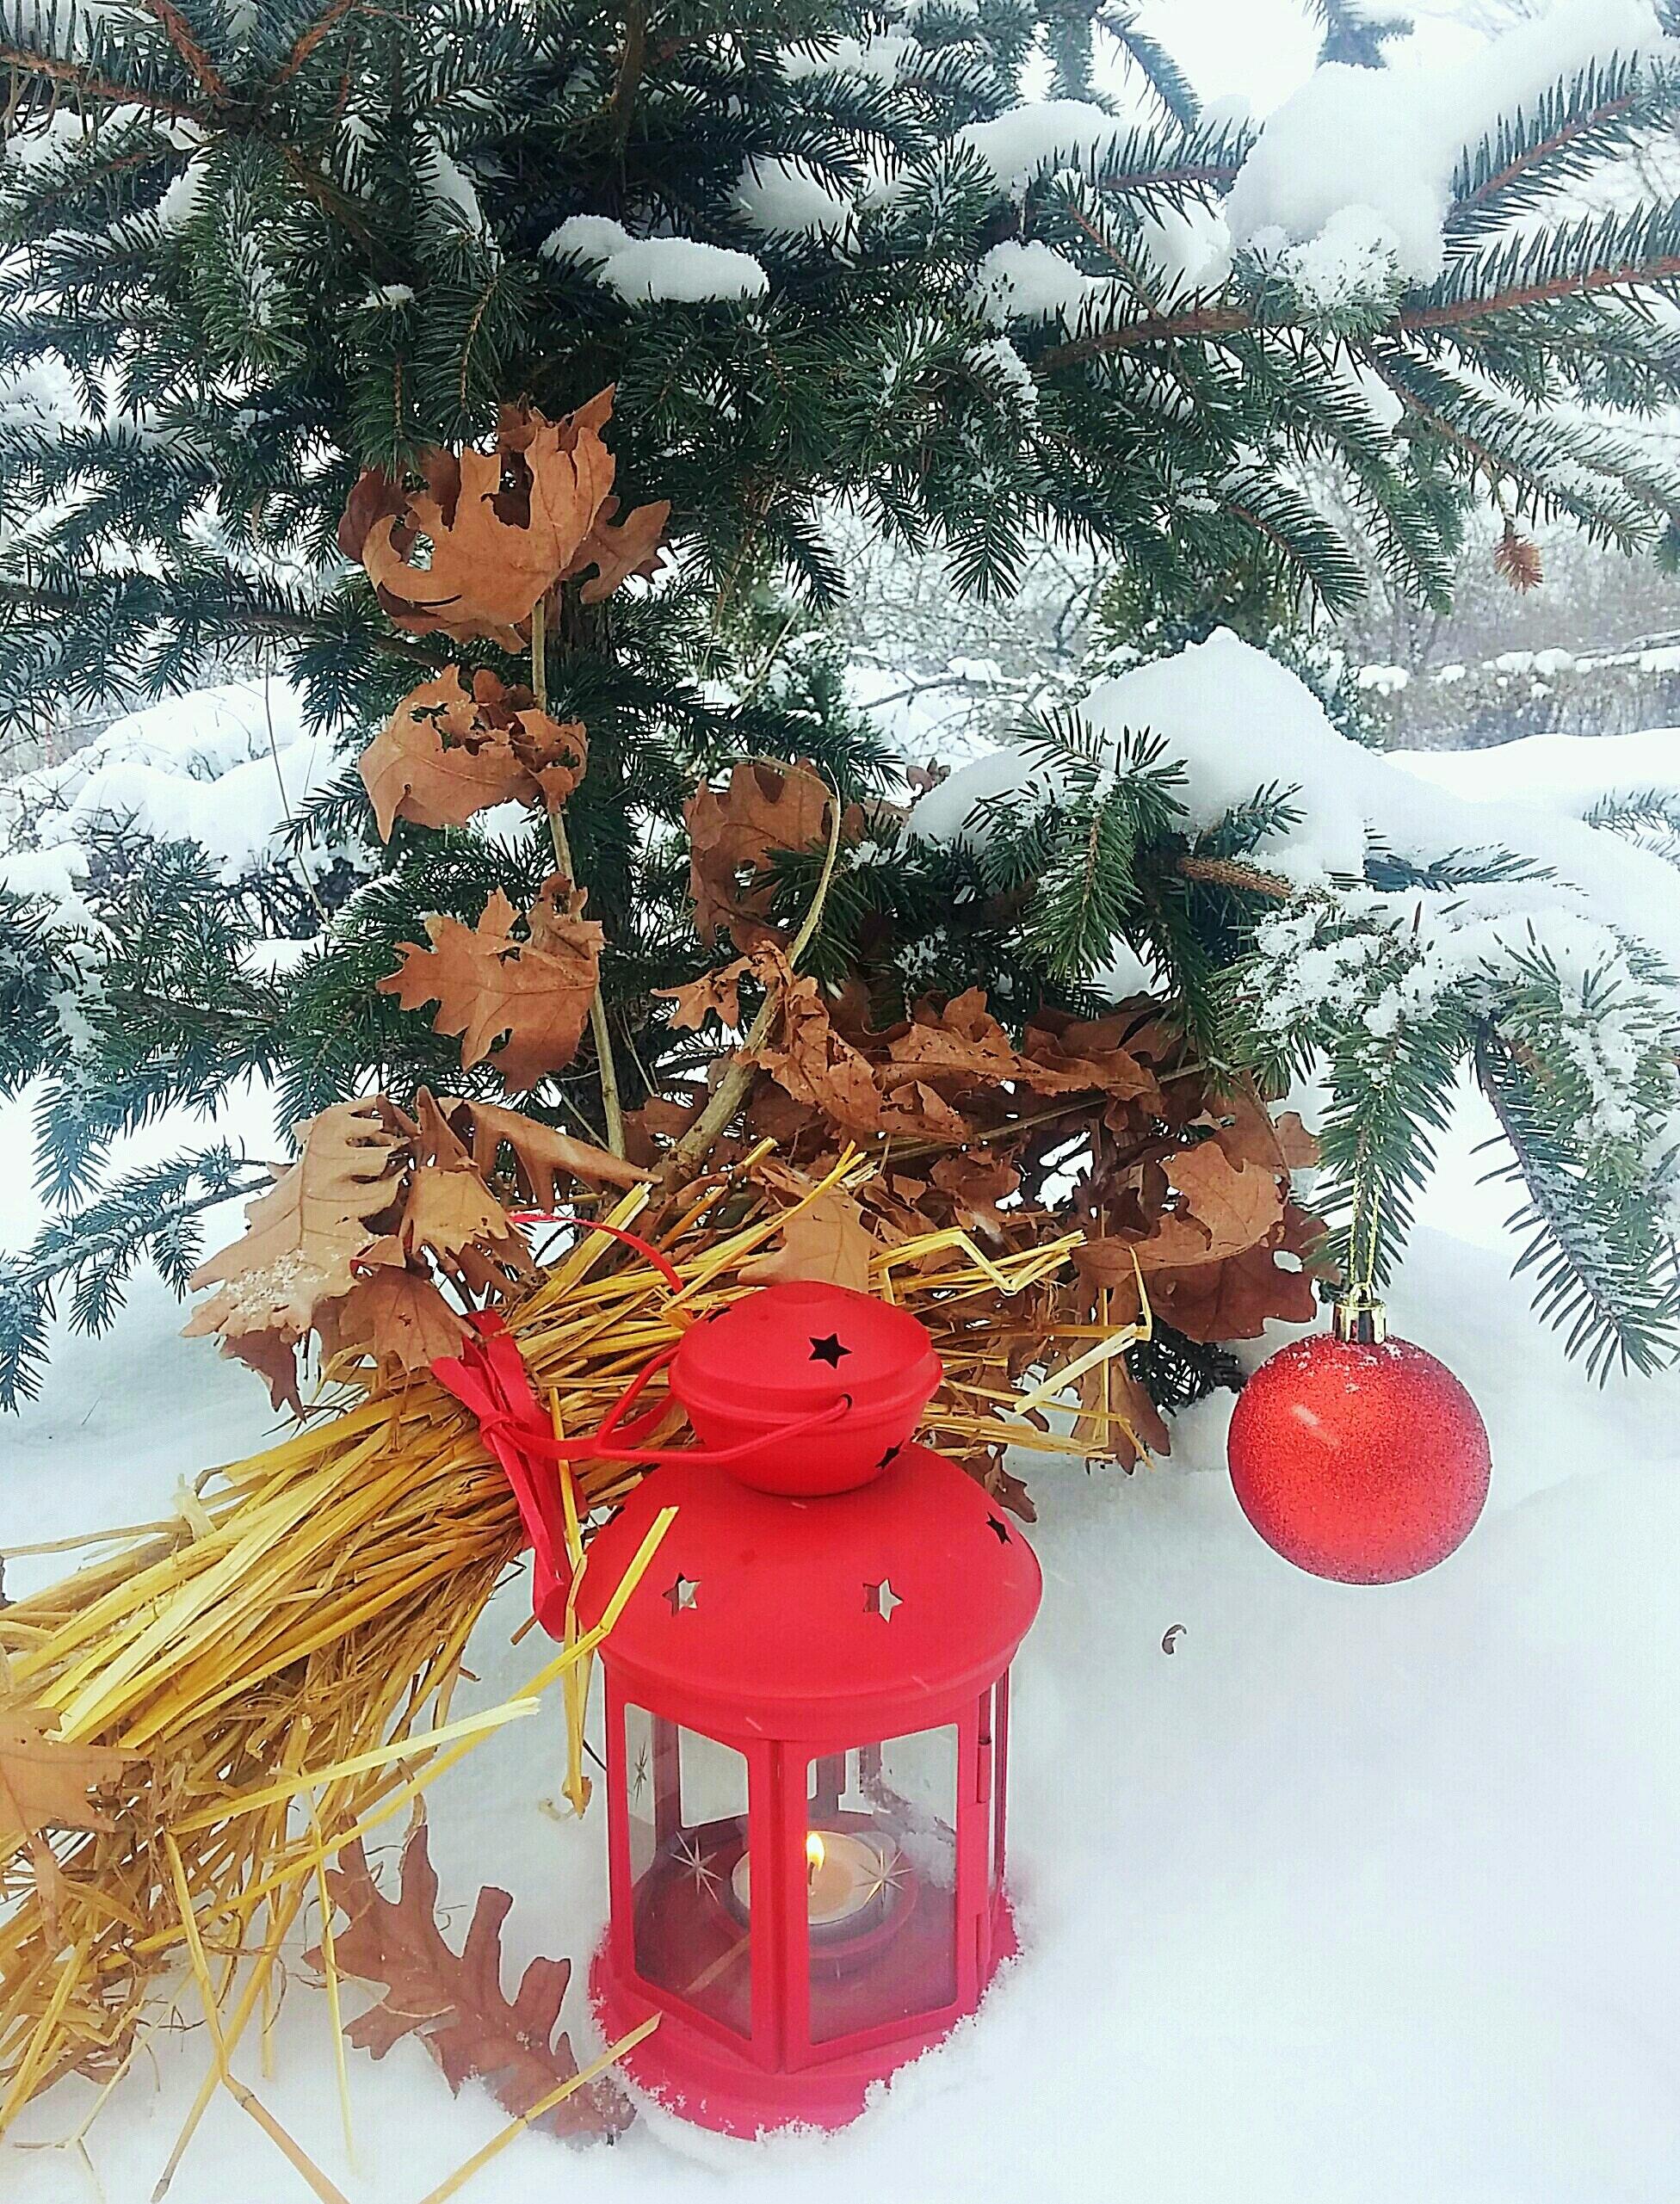 Weihnachten Orthodox.Free Stock Photo Of Orthodox Christmas Symbols